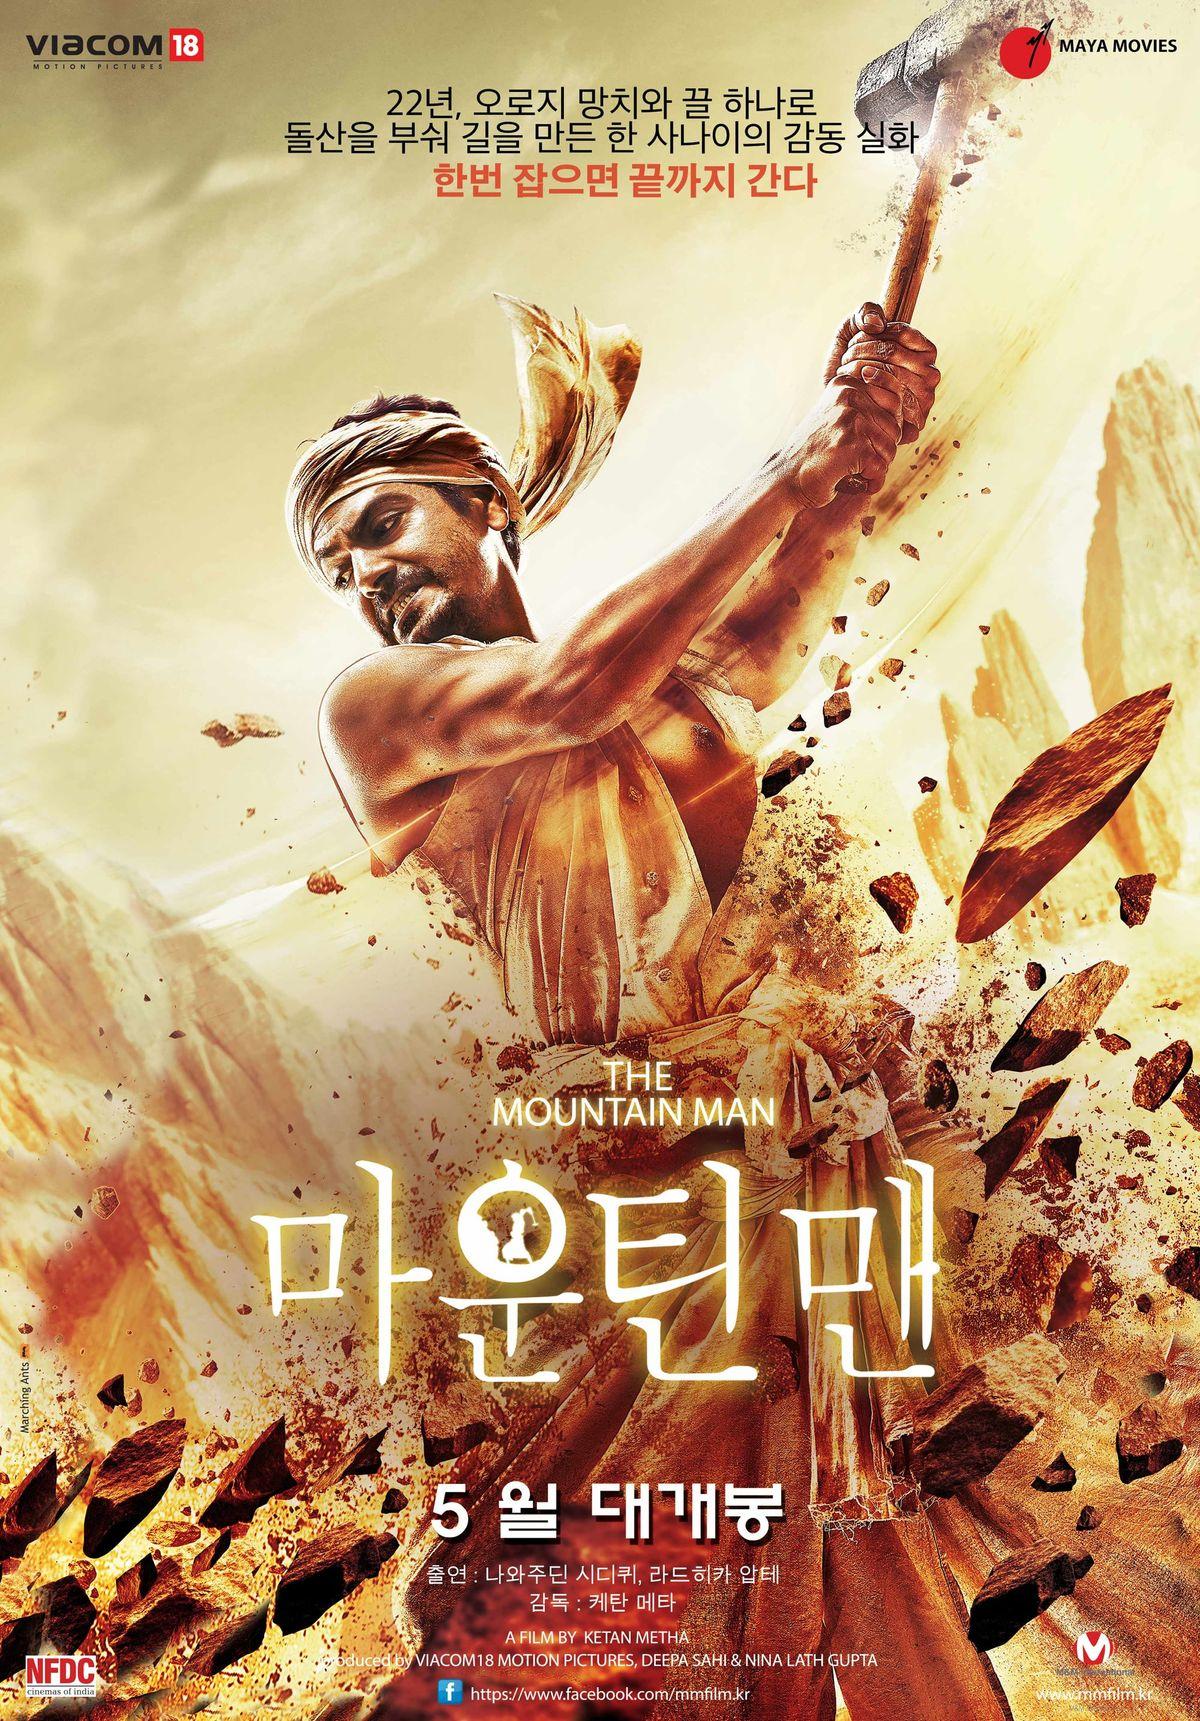 Prashant Narayanan Best Movies, TV Shows and Web Series List